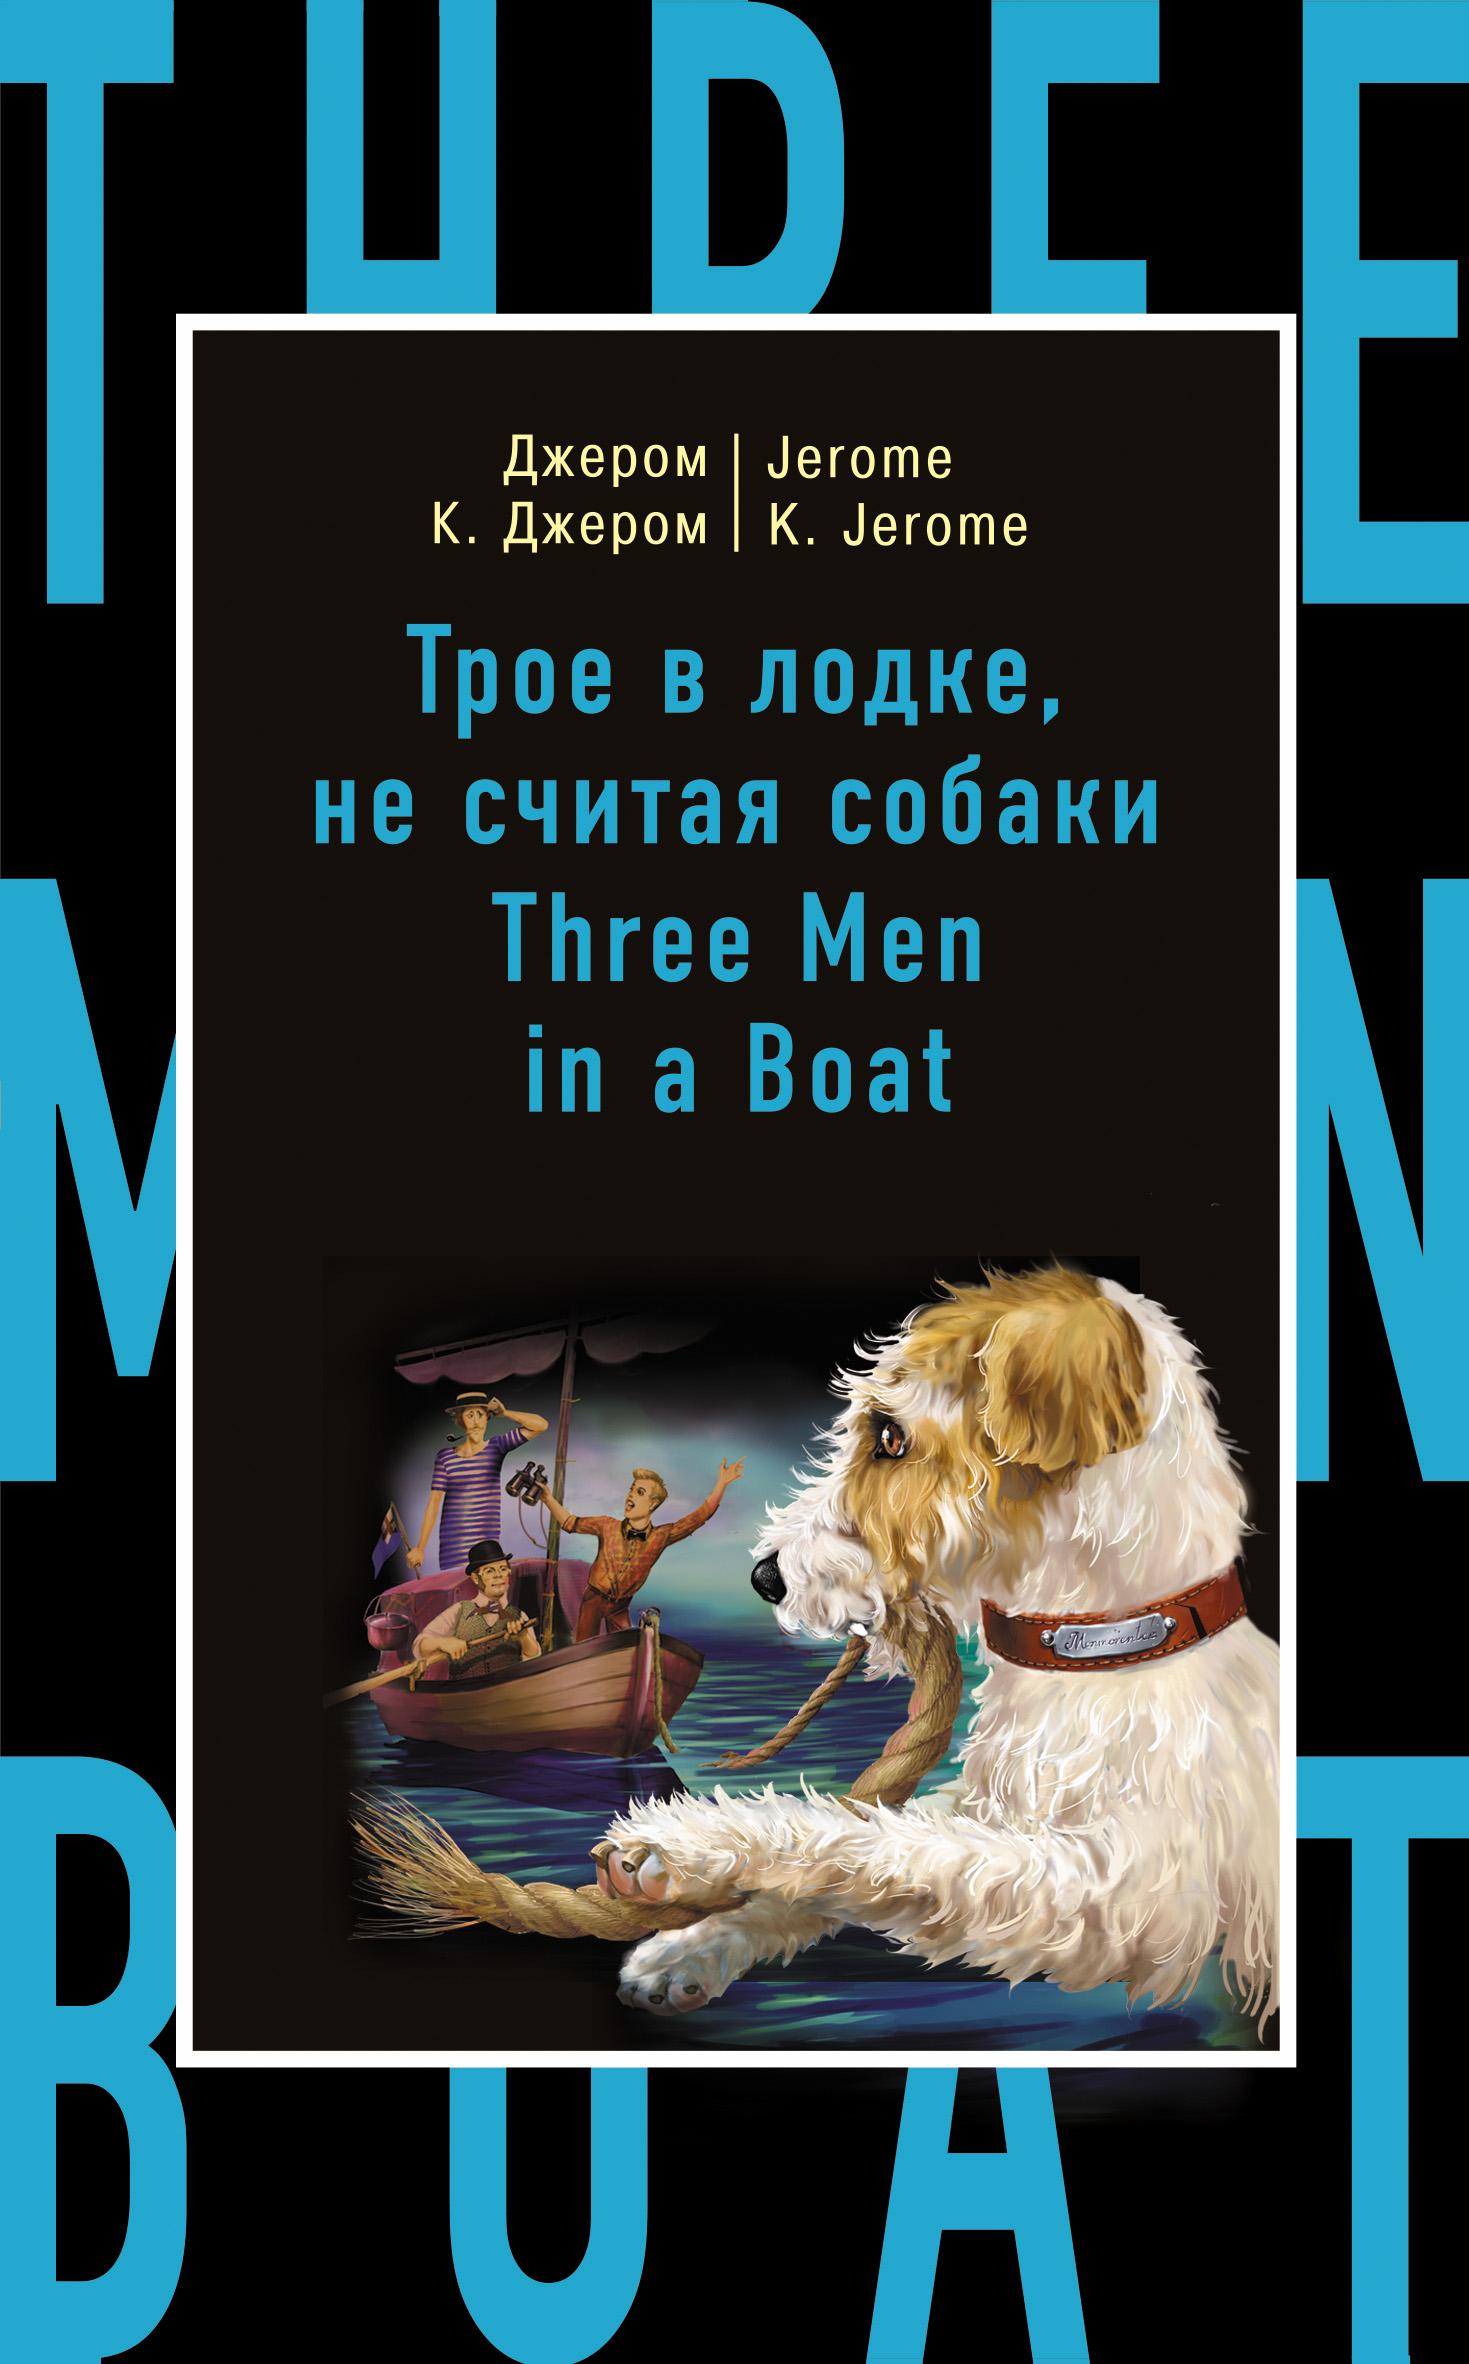 Джером Клапка Джером Трое в лодке, не считая собаки / Three Men in a Boat (to Say Nothing of the Dog)